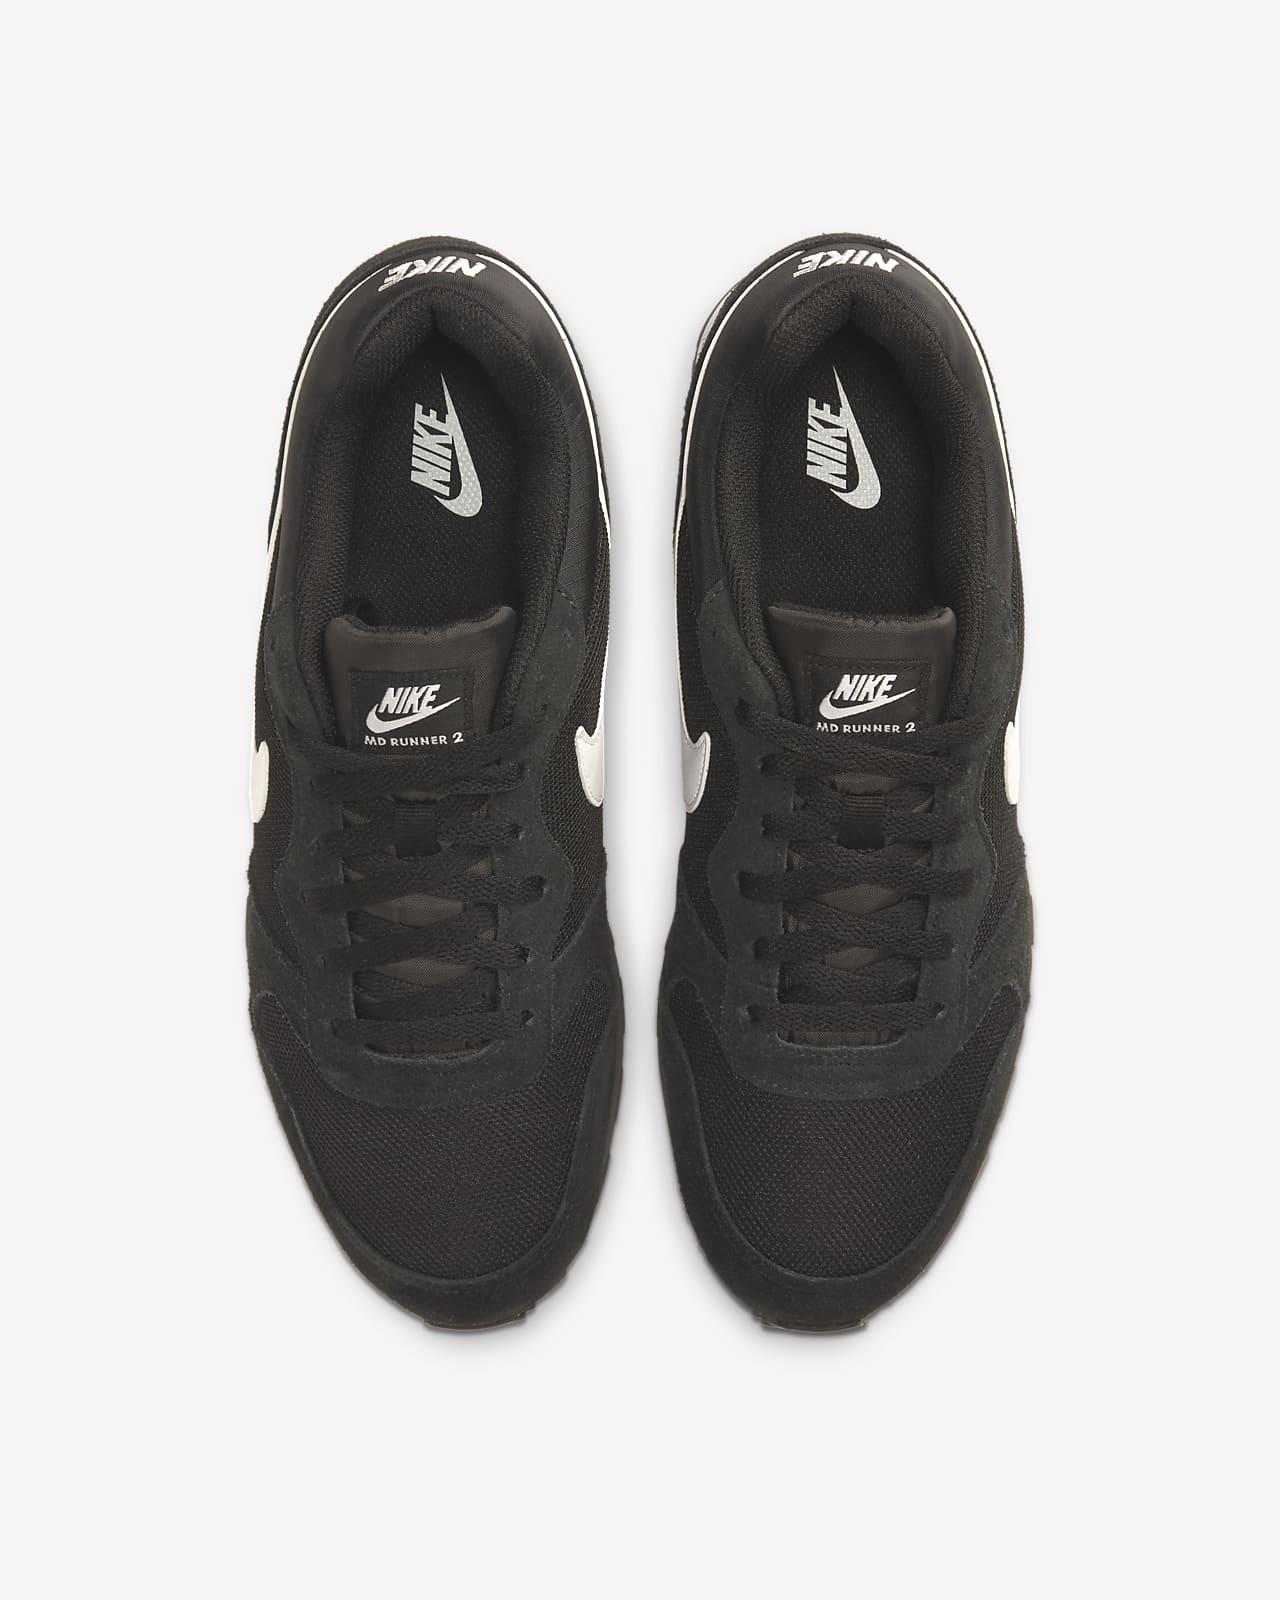 Nike MD Runner 2 Chaussures De Sport Sneaker Homme 749794 001 Gris